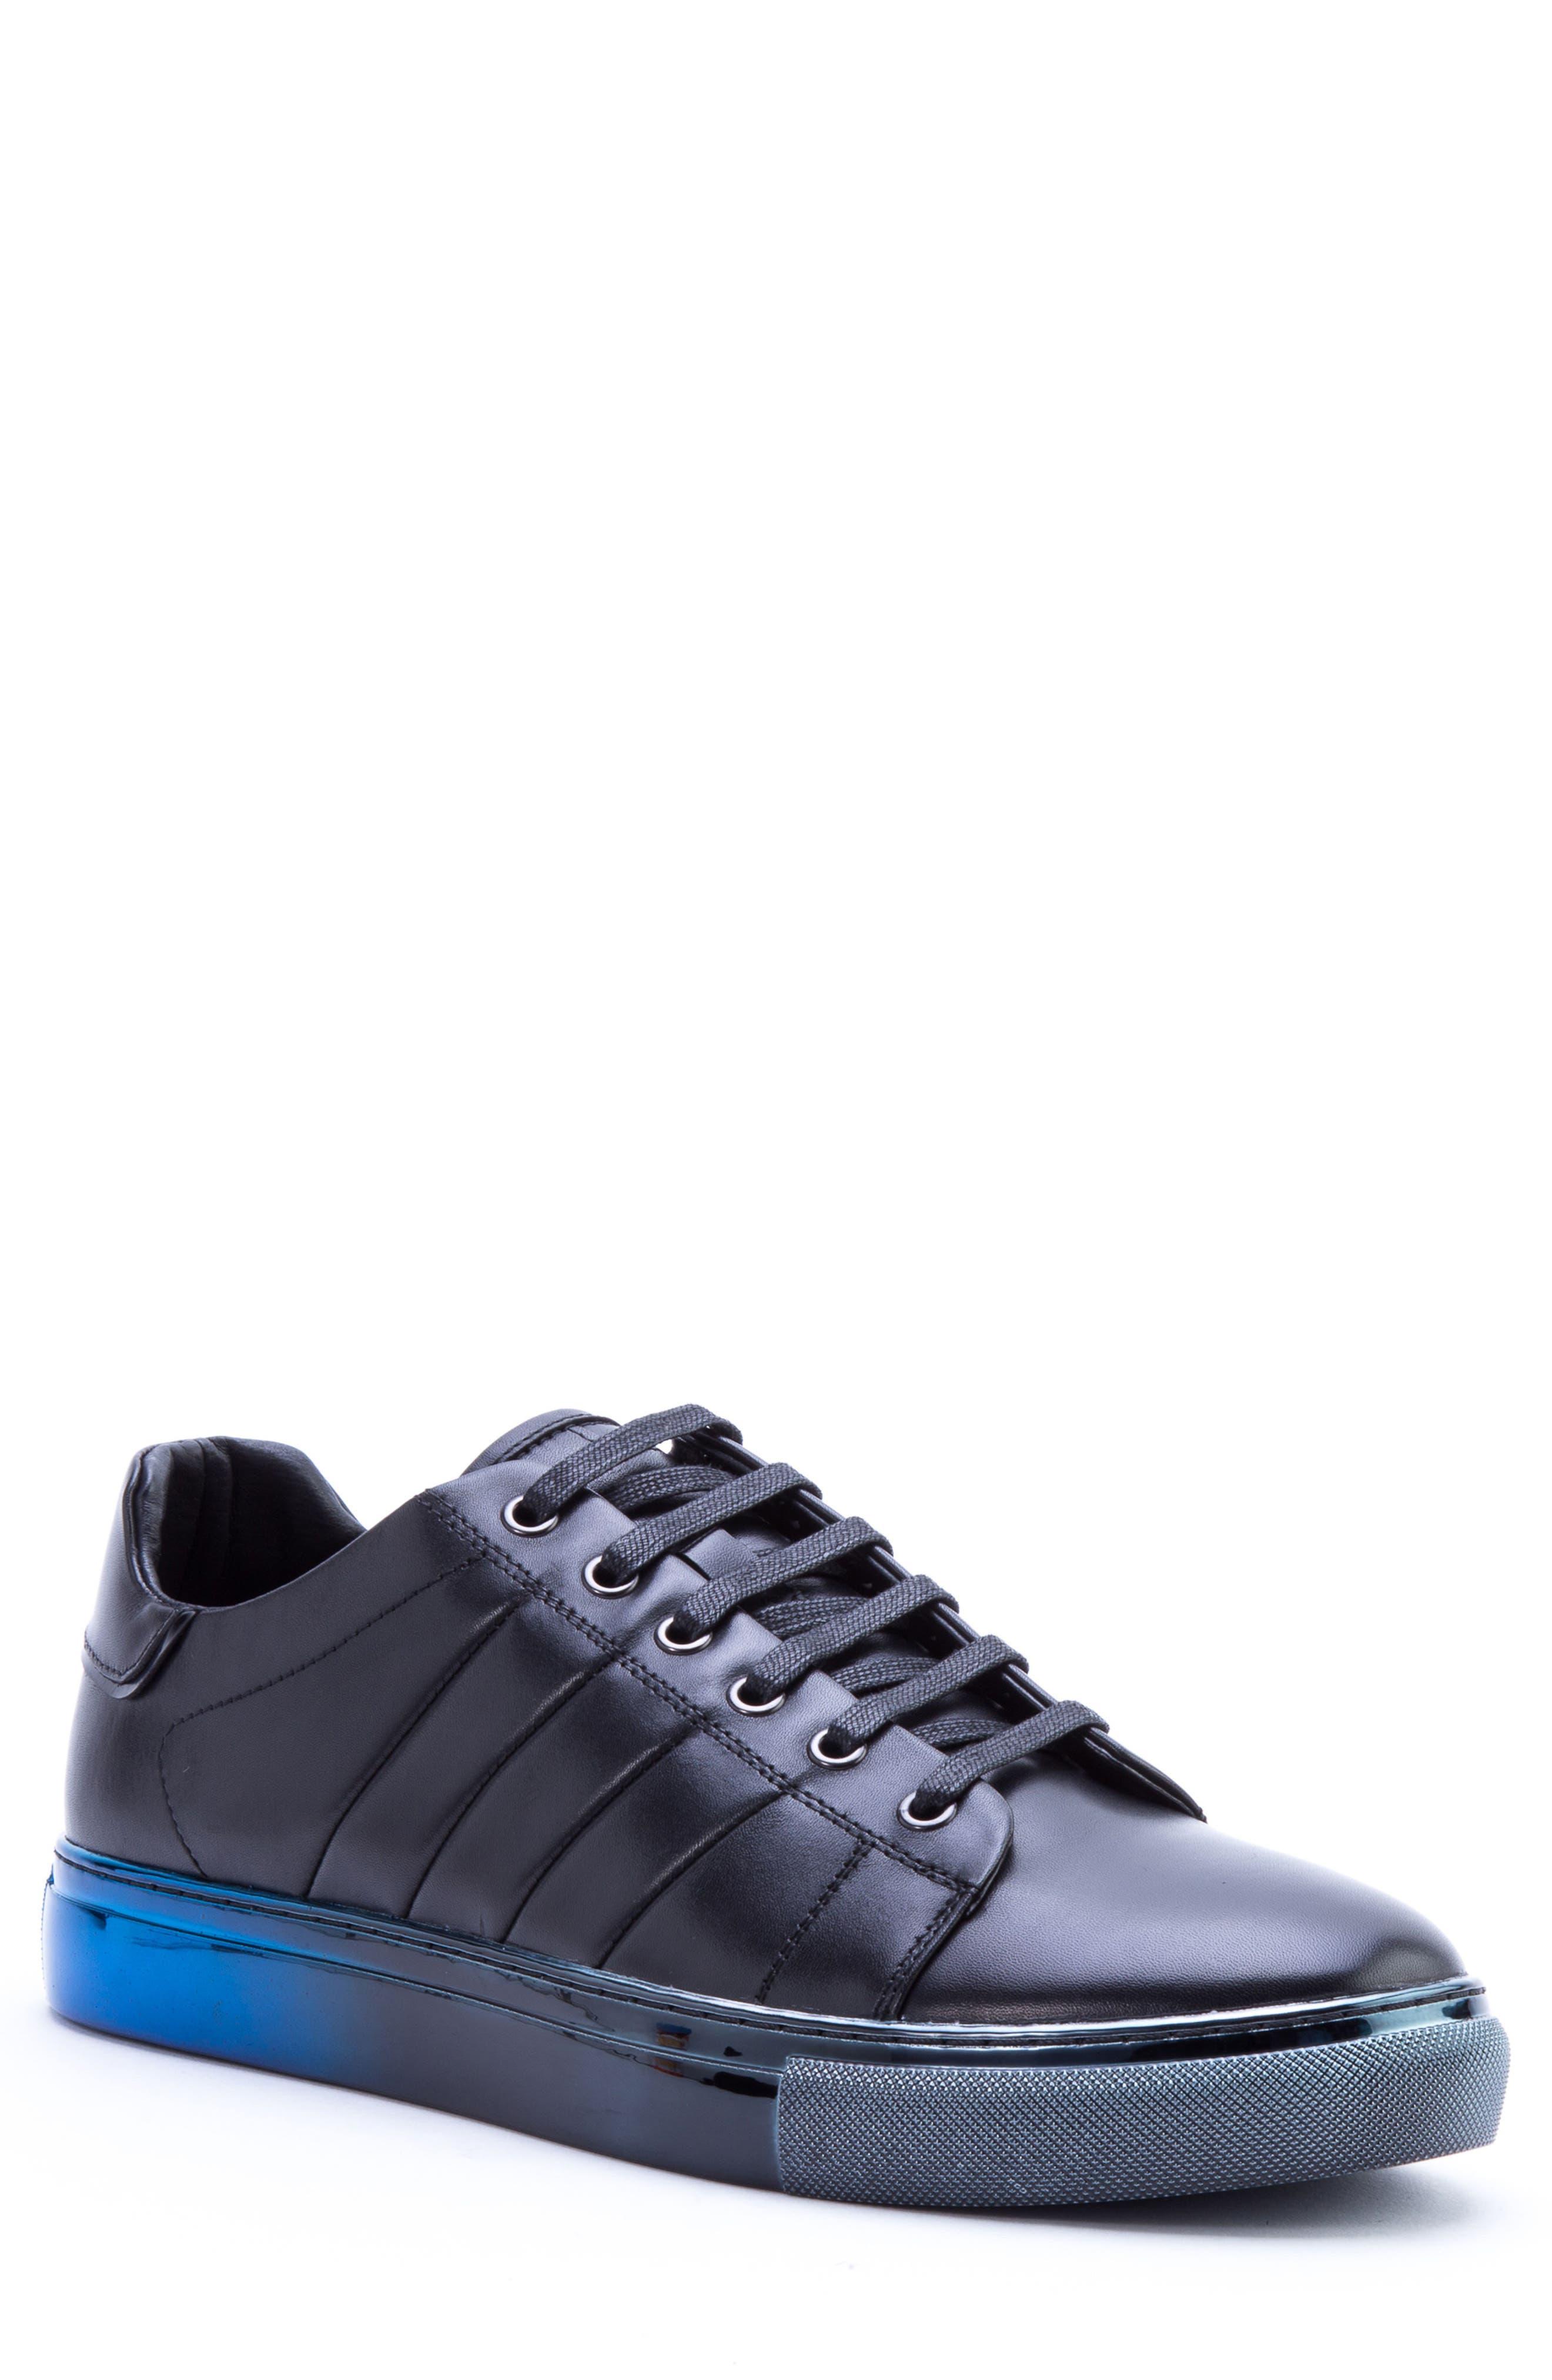 Badgley Mischka Brando Sneaker,                             Main thumbnail 1, color,                             BLACK LEATHER